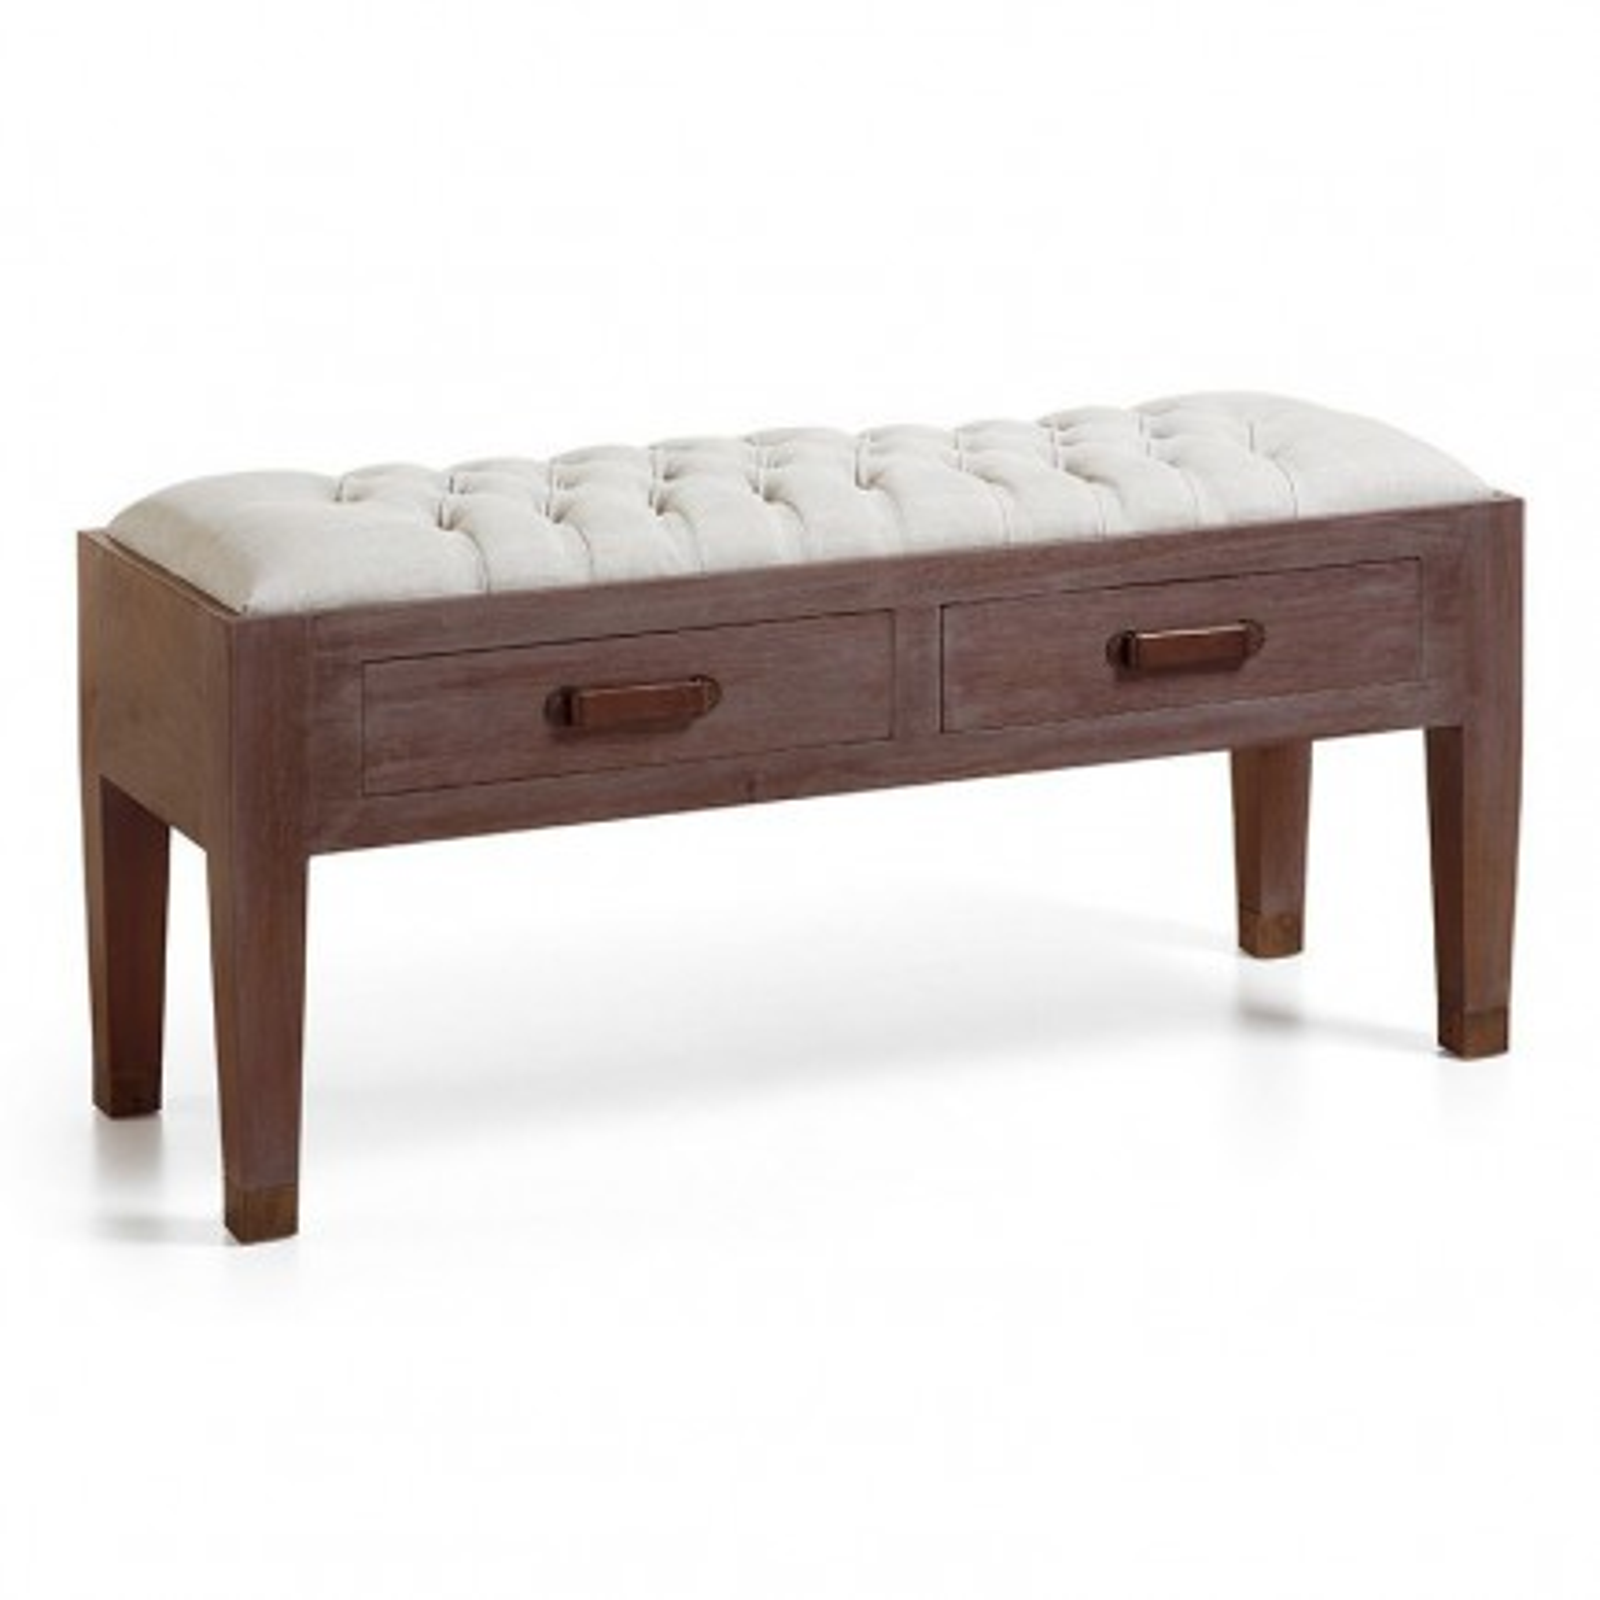 Banc Vintage Mindi Massif - meuble en bois massif